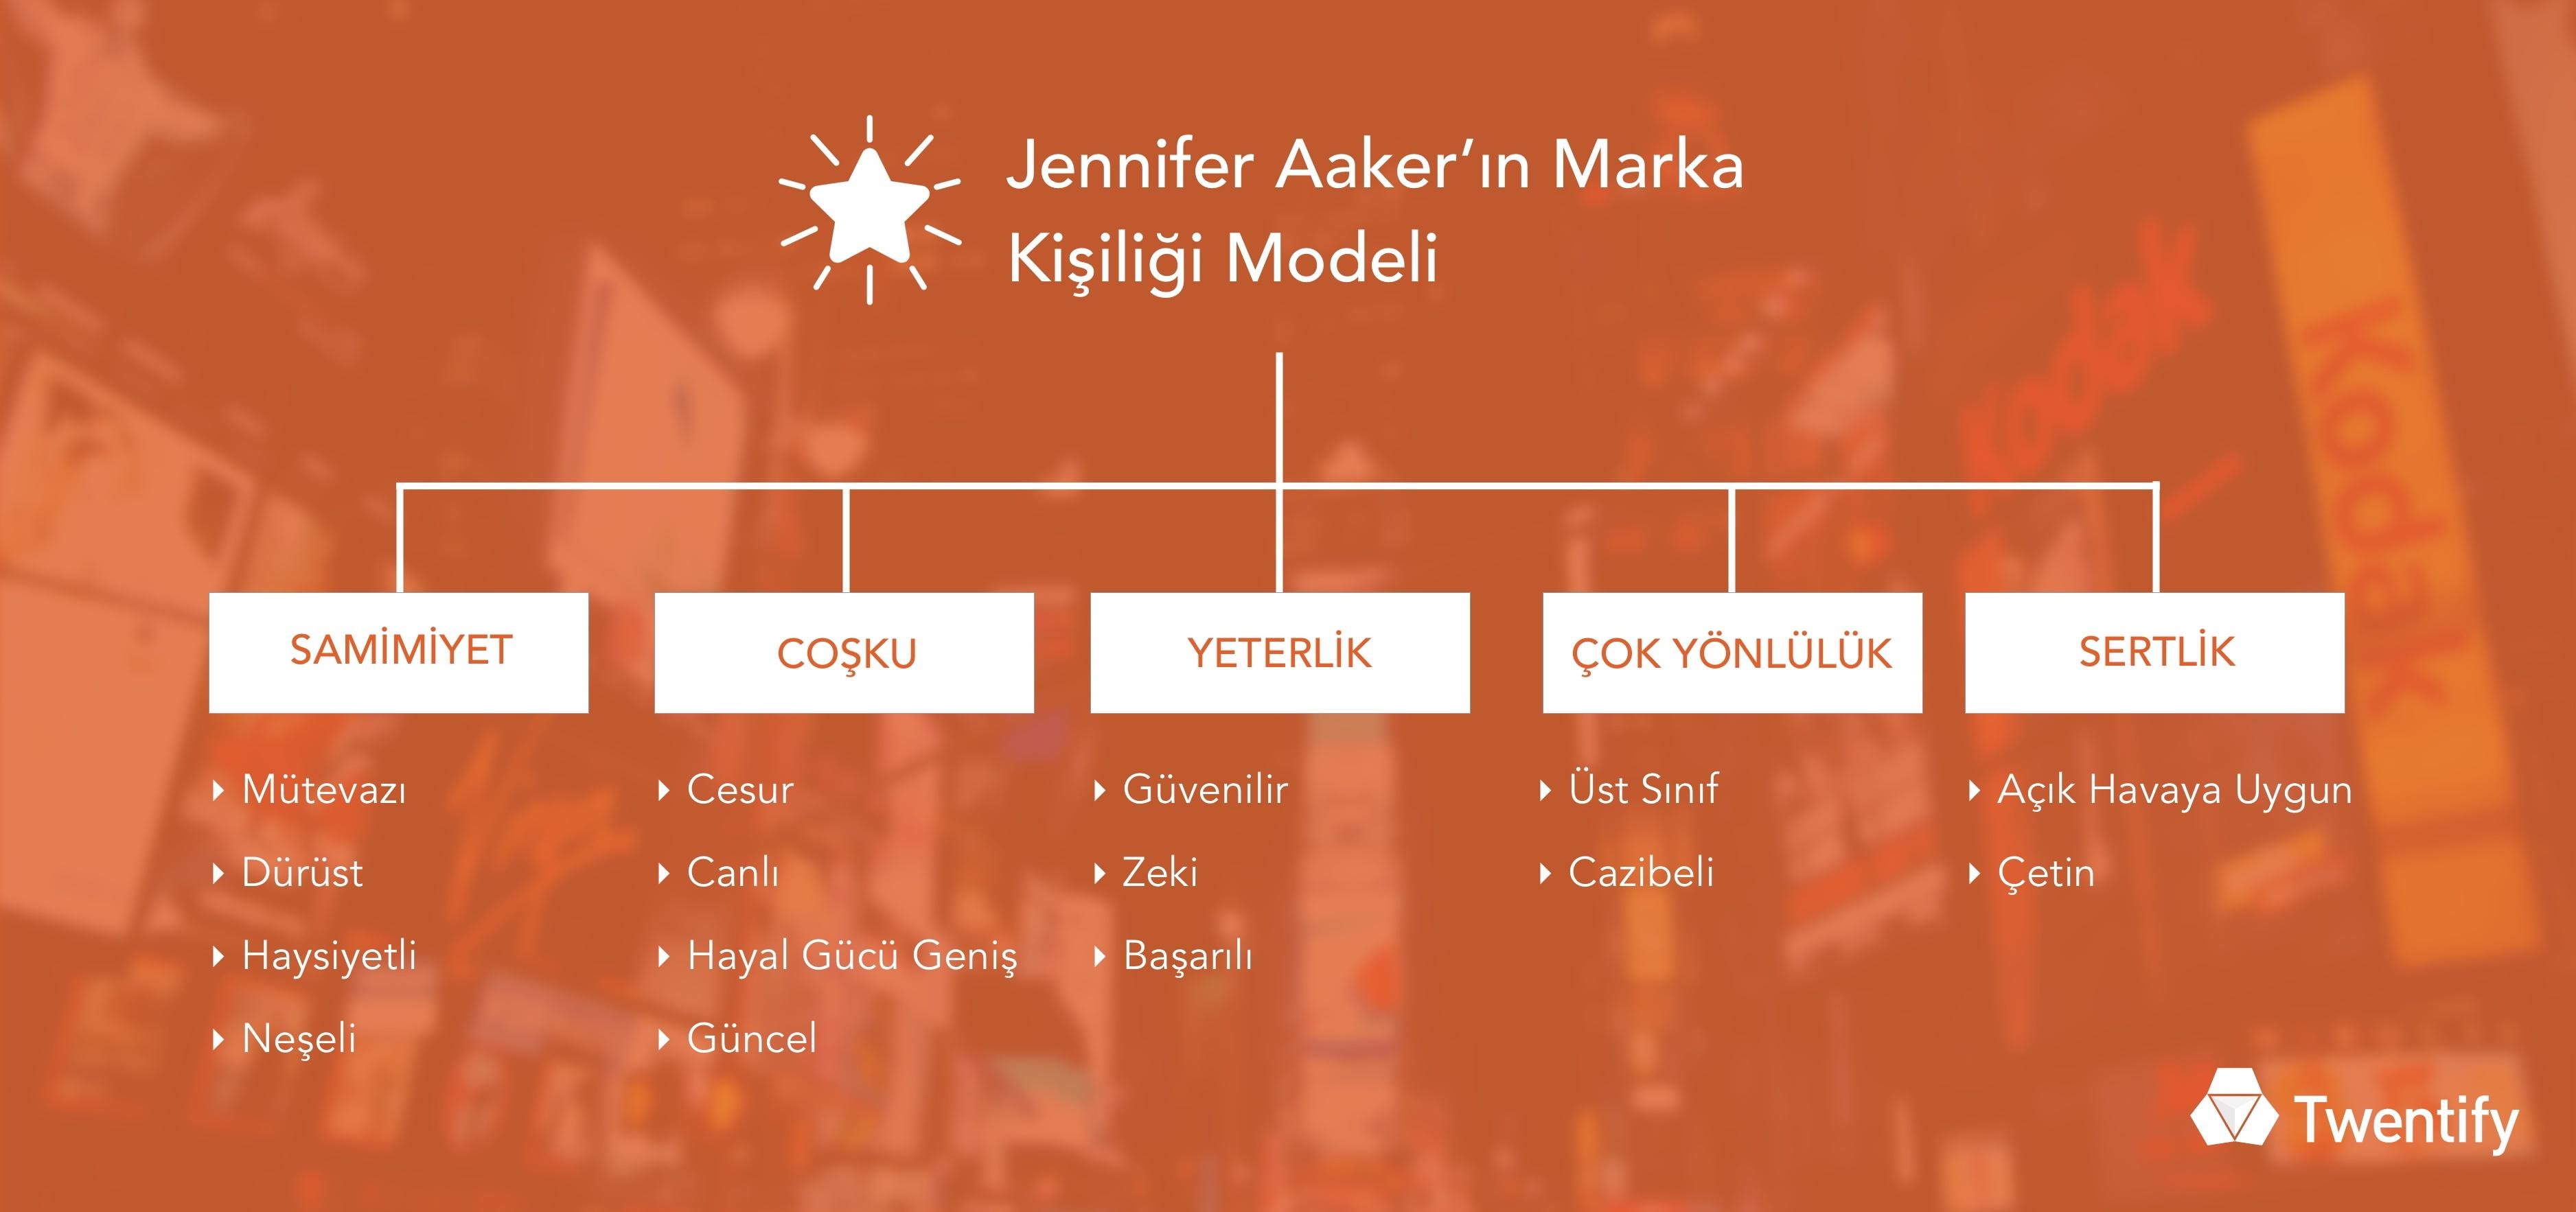 aaker_marka_kisiligi_modeli